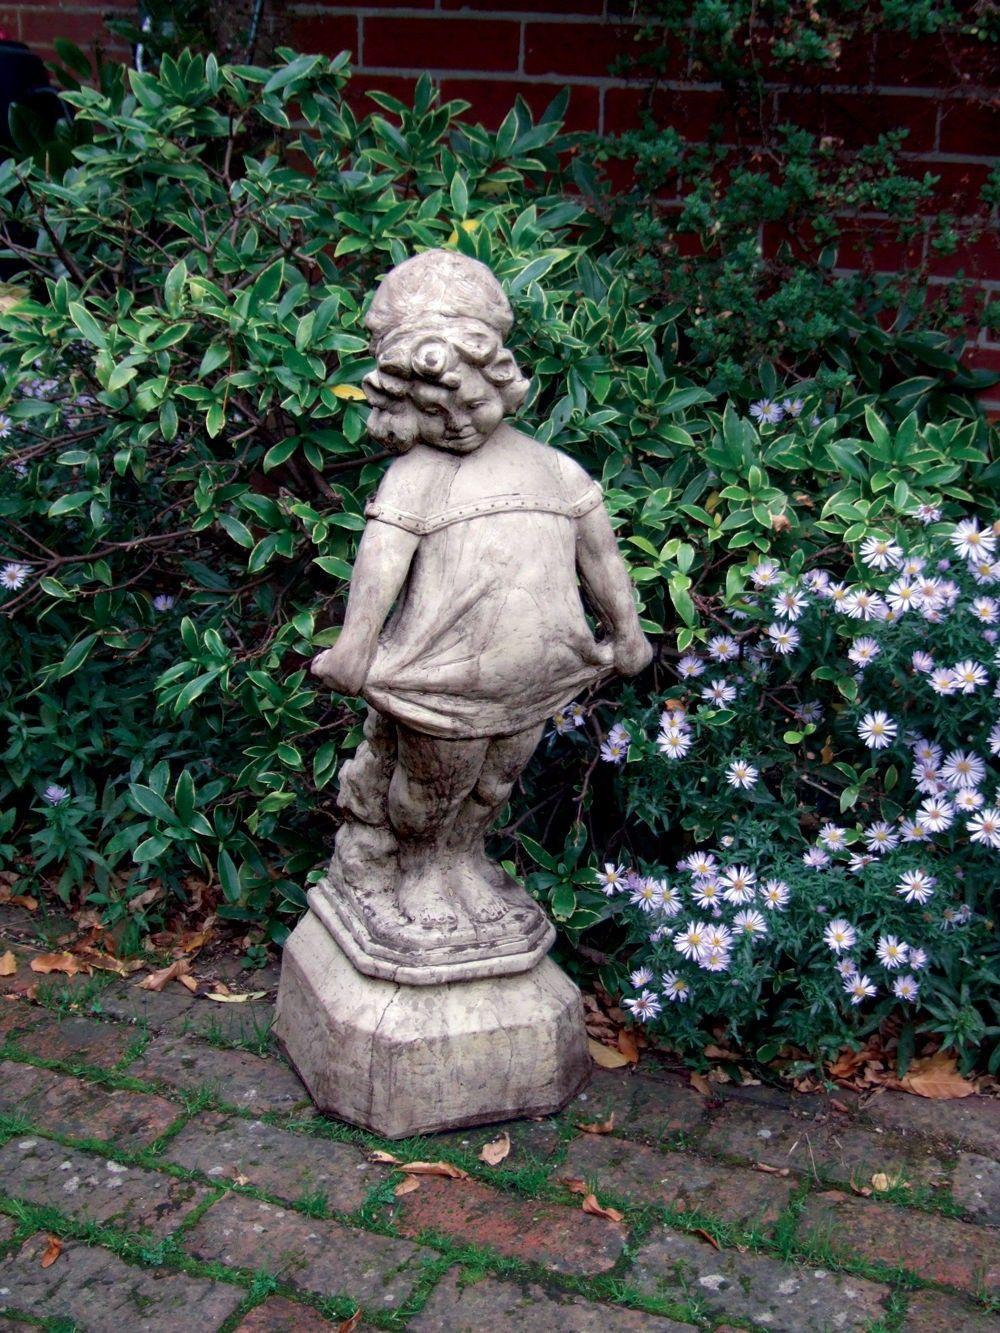 Victorian Girl Stone Sculpture Large Garden Statue | Su0026S Shop